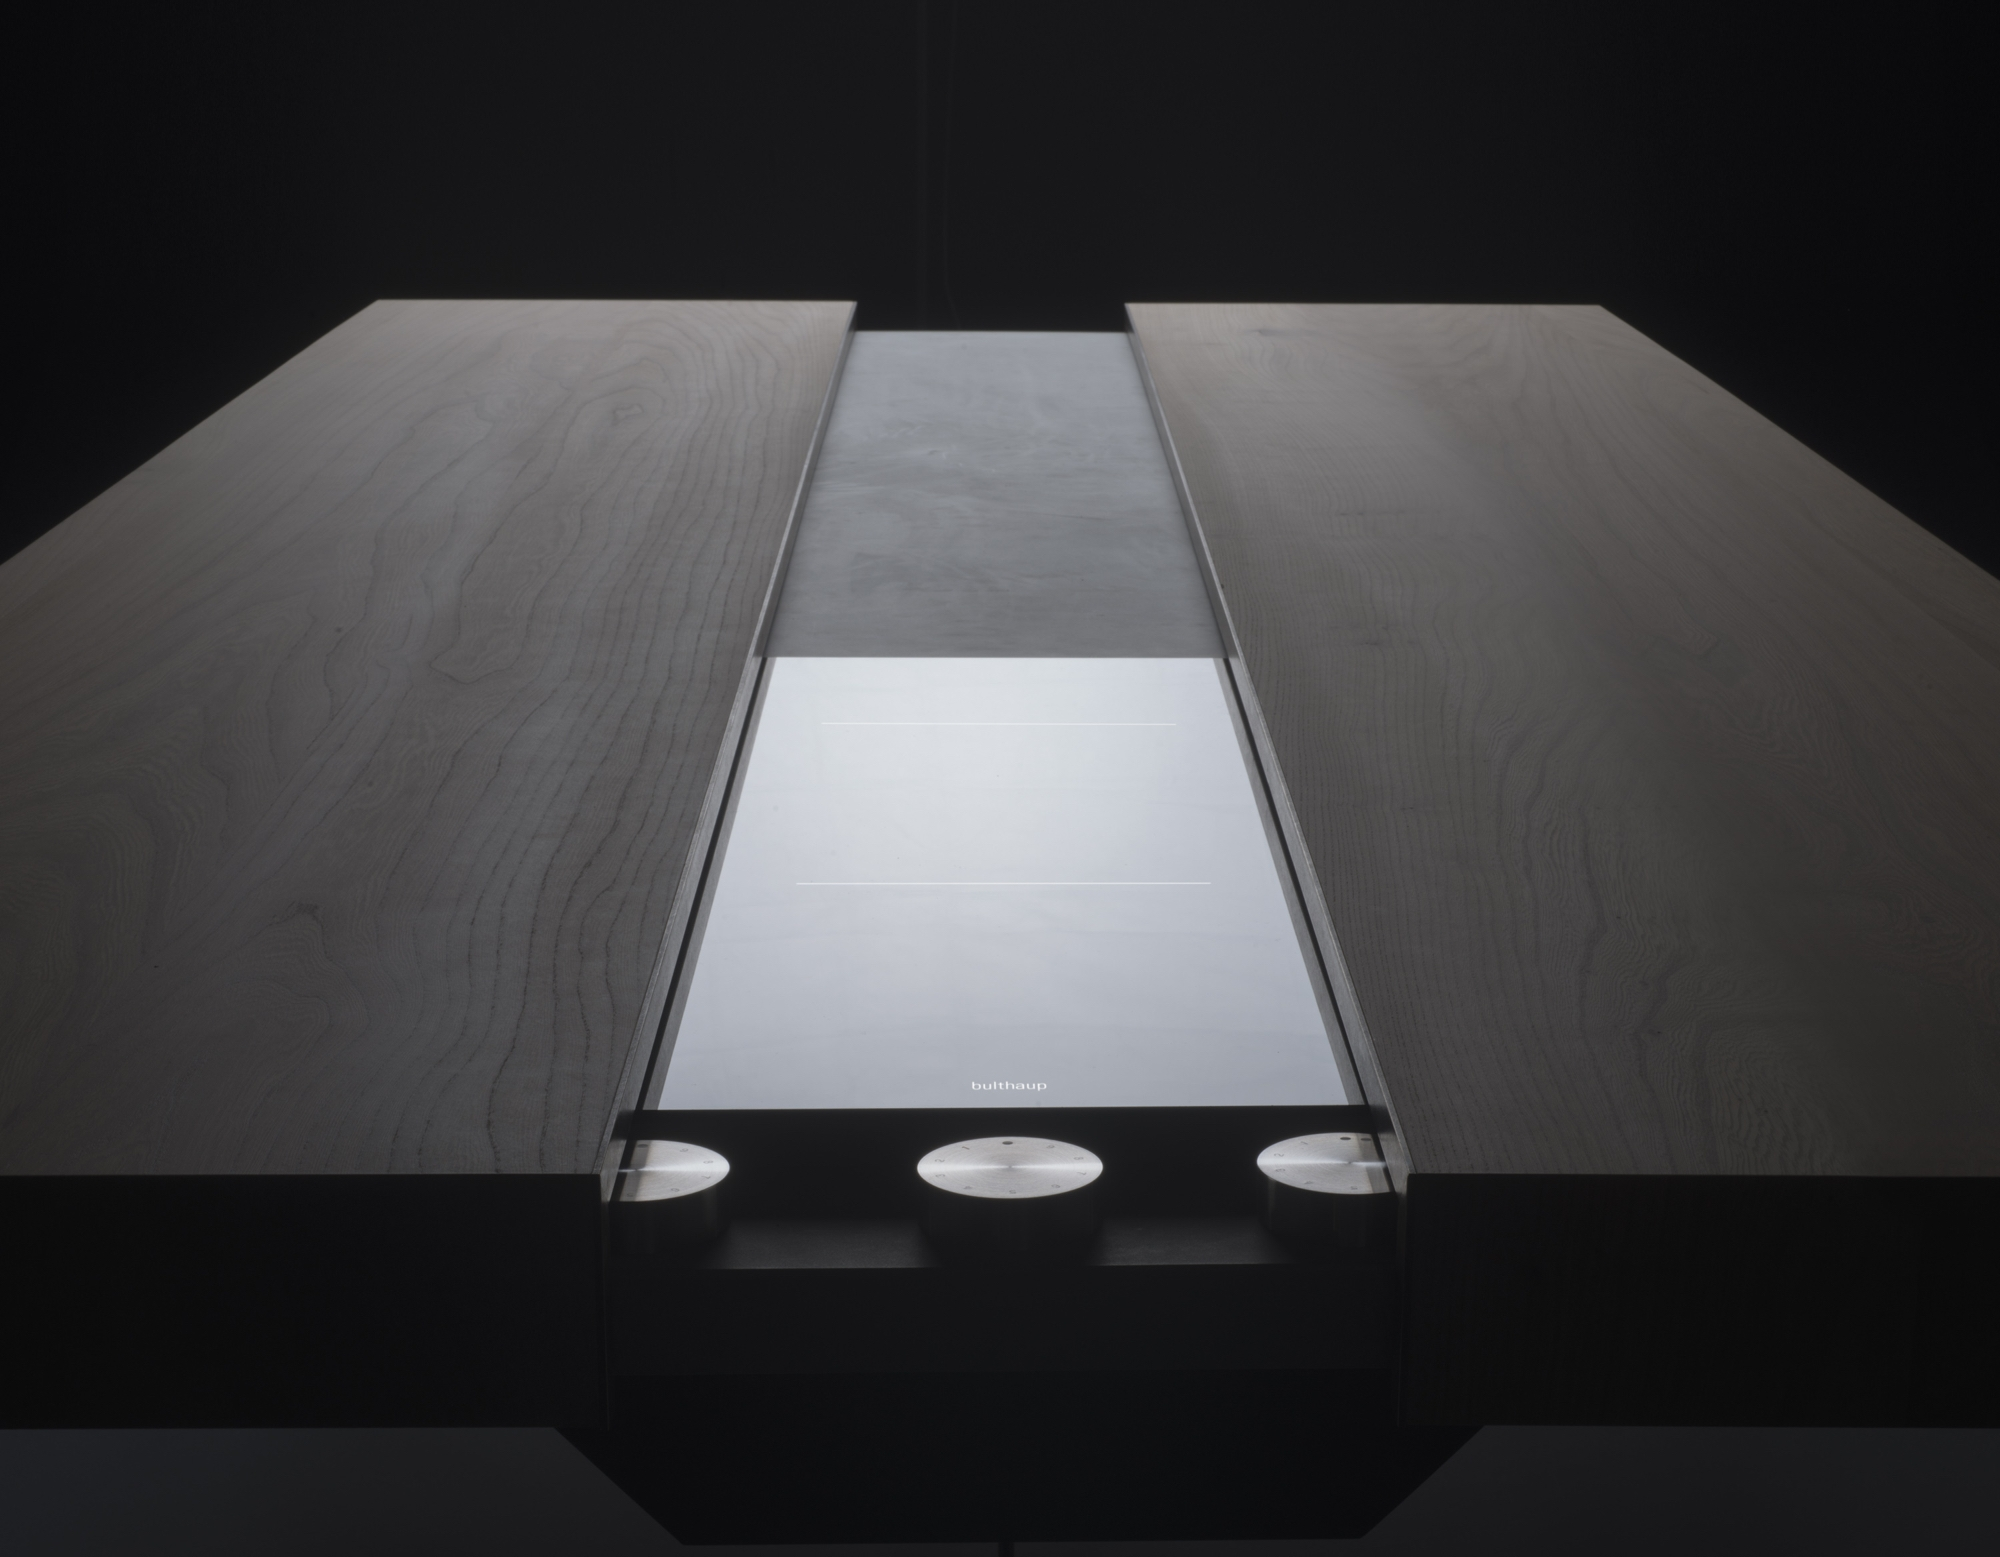 bultaup-table-1.jpg